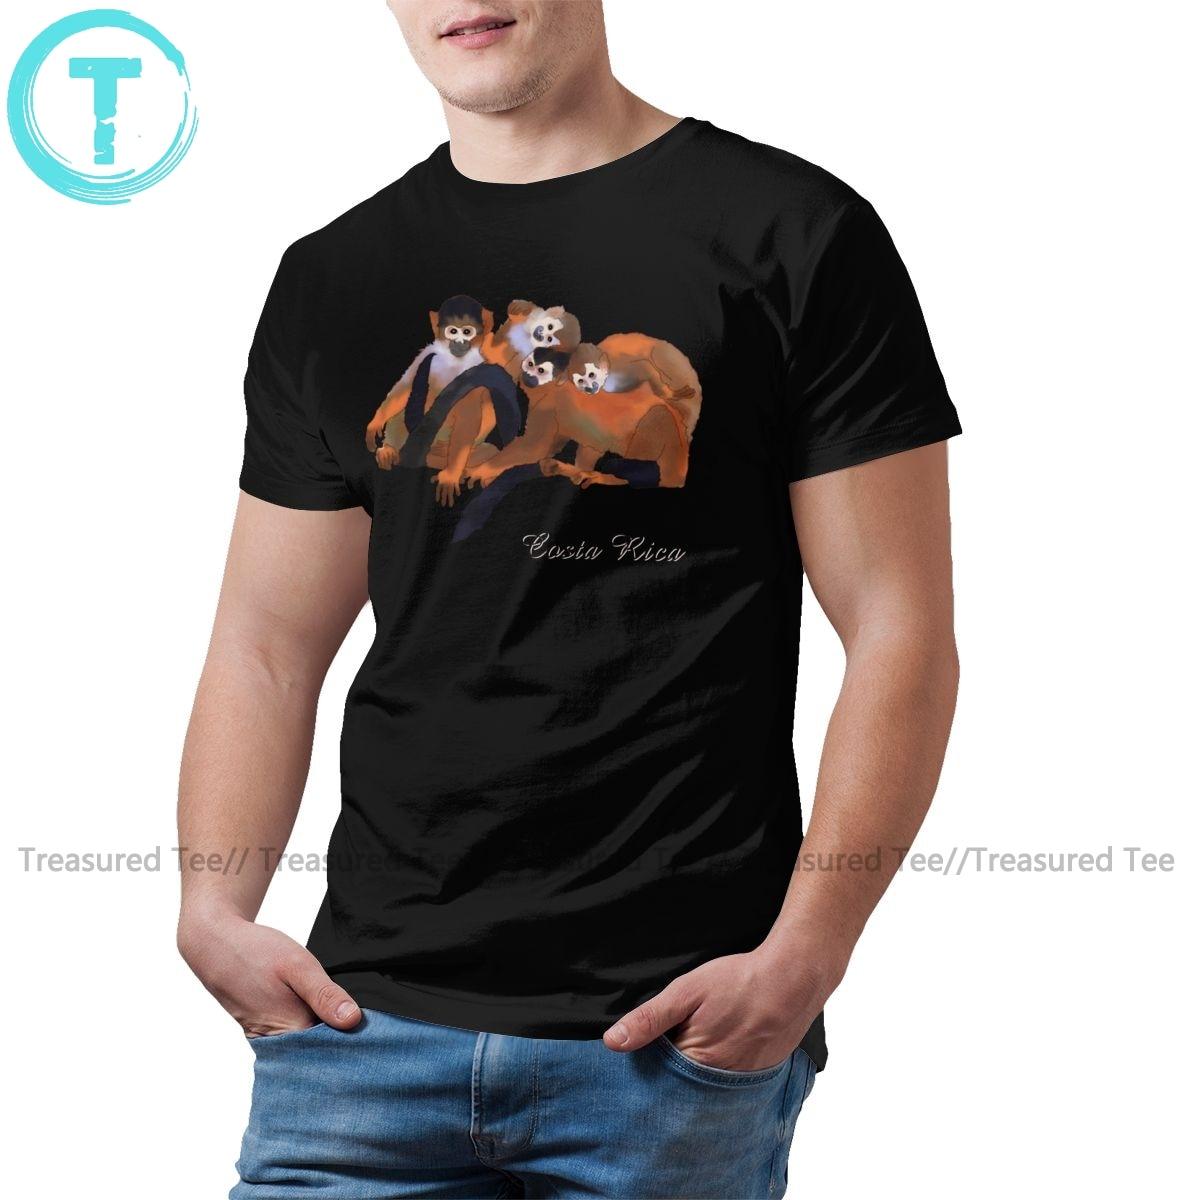 Titi camiseta Costa Rica Titi camiseta con mono estampado lindo camiseta mangas cortas 100 algodón camiseta grande